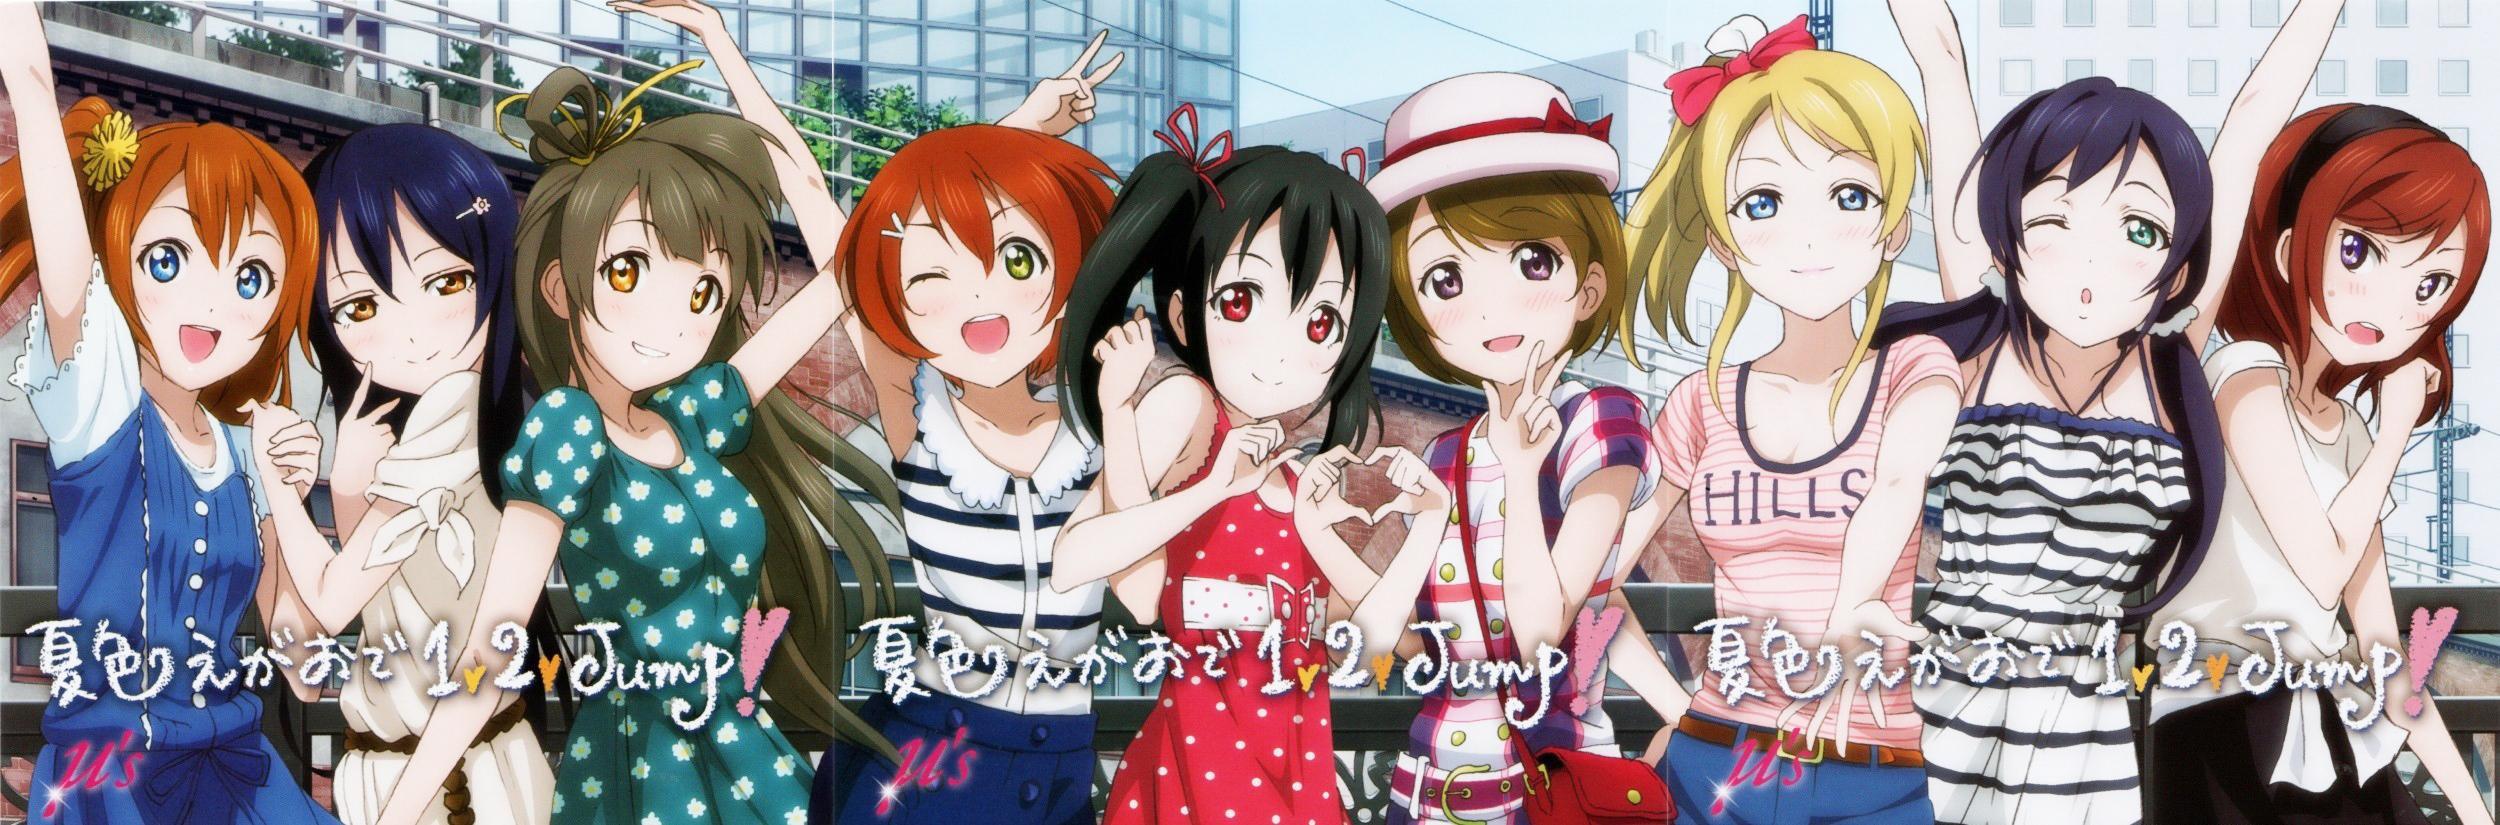 Love live zerochan anime image board - Love live wallpaper 540x960 ...